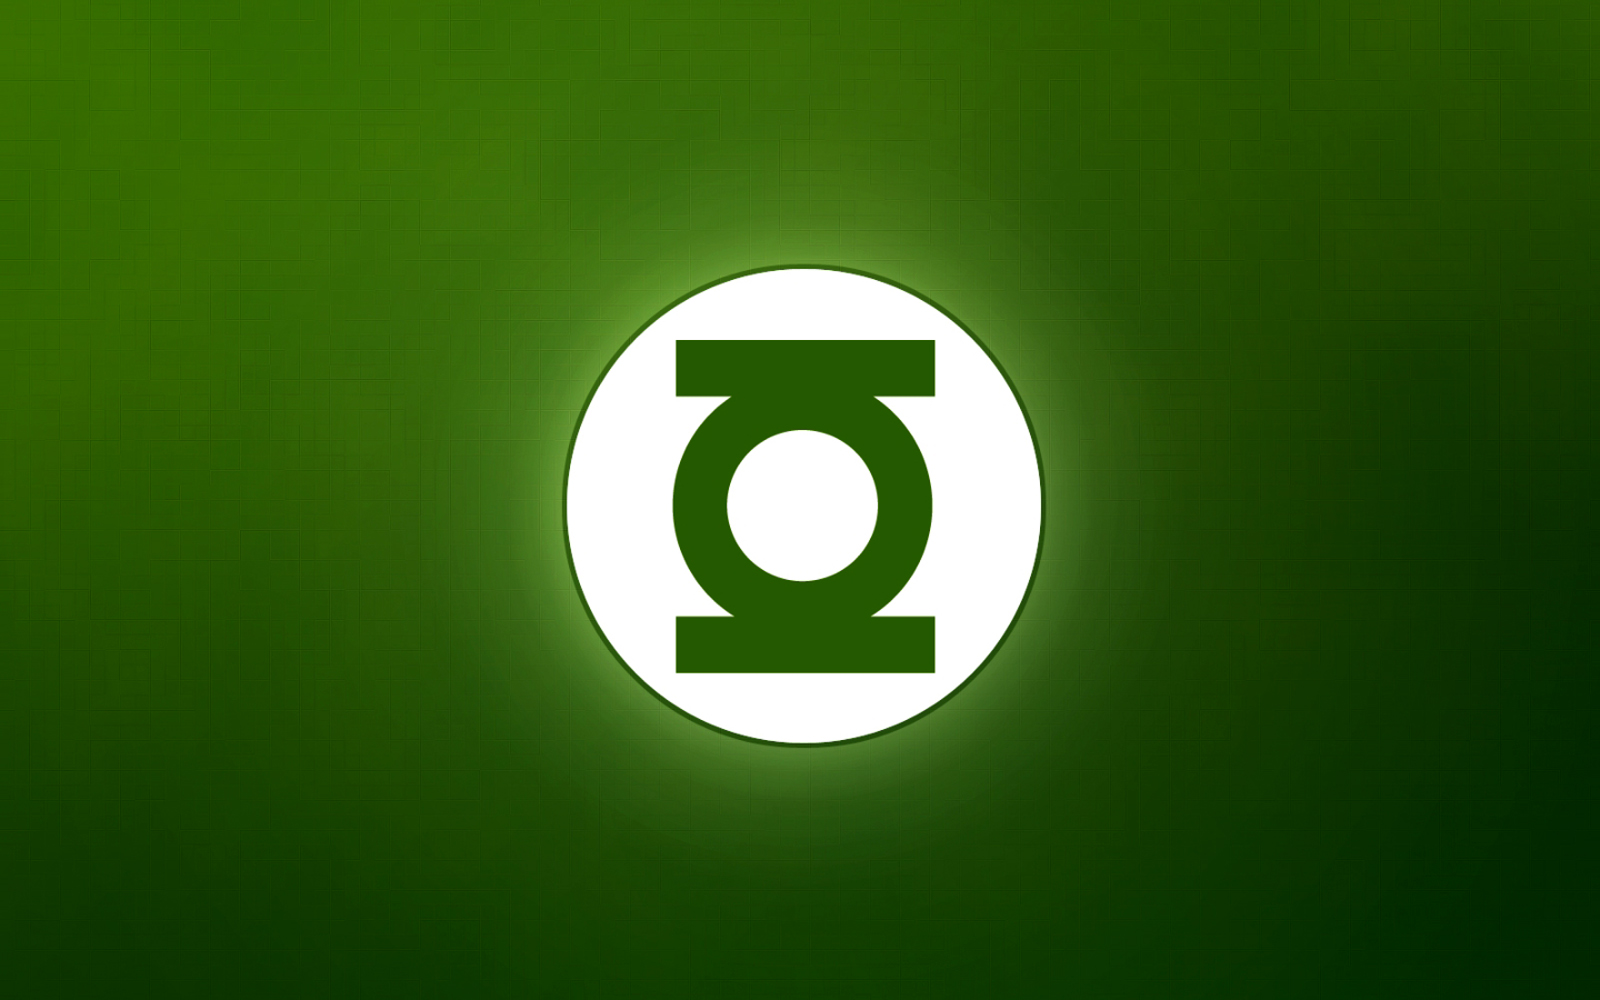 green lantern comics logo minimal hd wallpapers hq. Black Bedroom Furniture Sets. Home Design Ideas